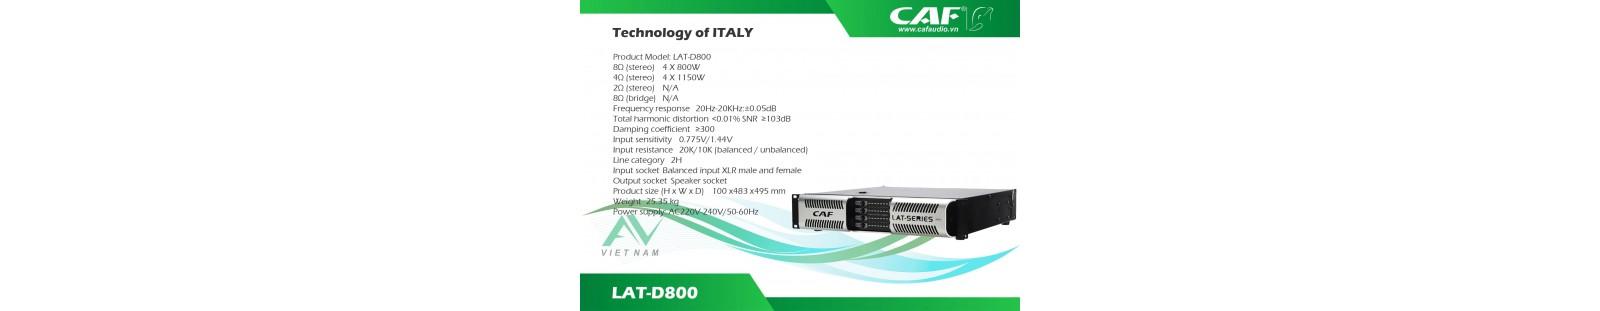 CAF LAT D800